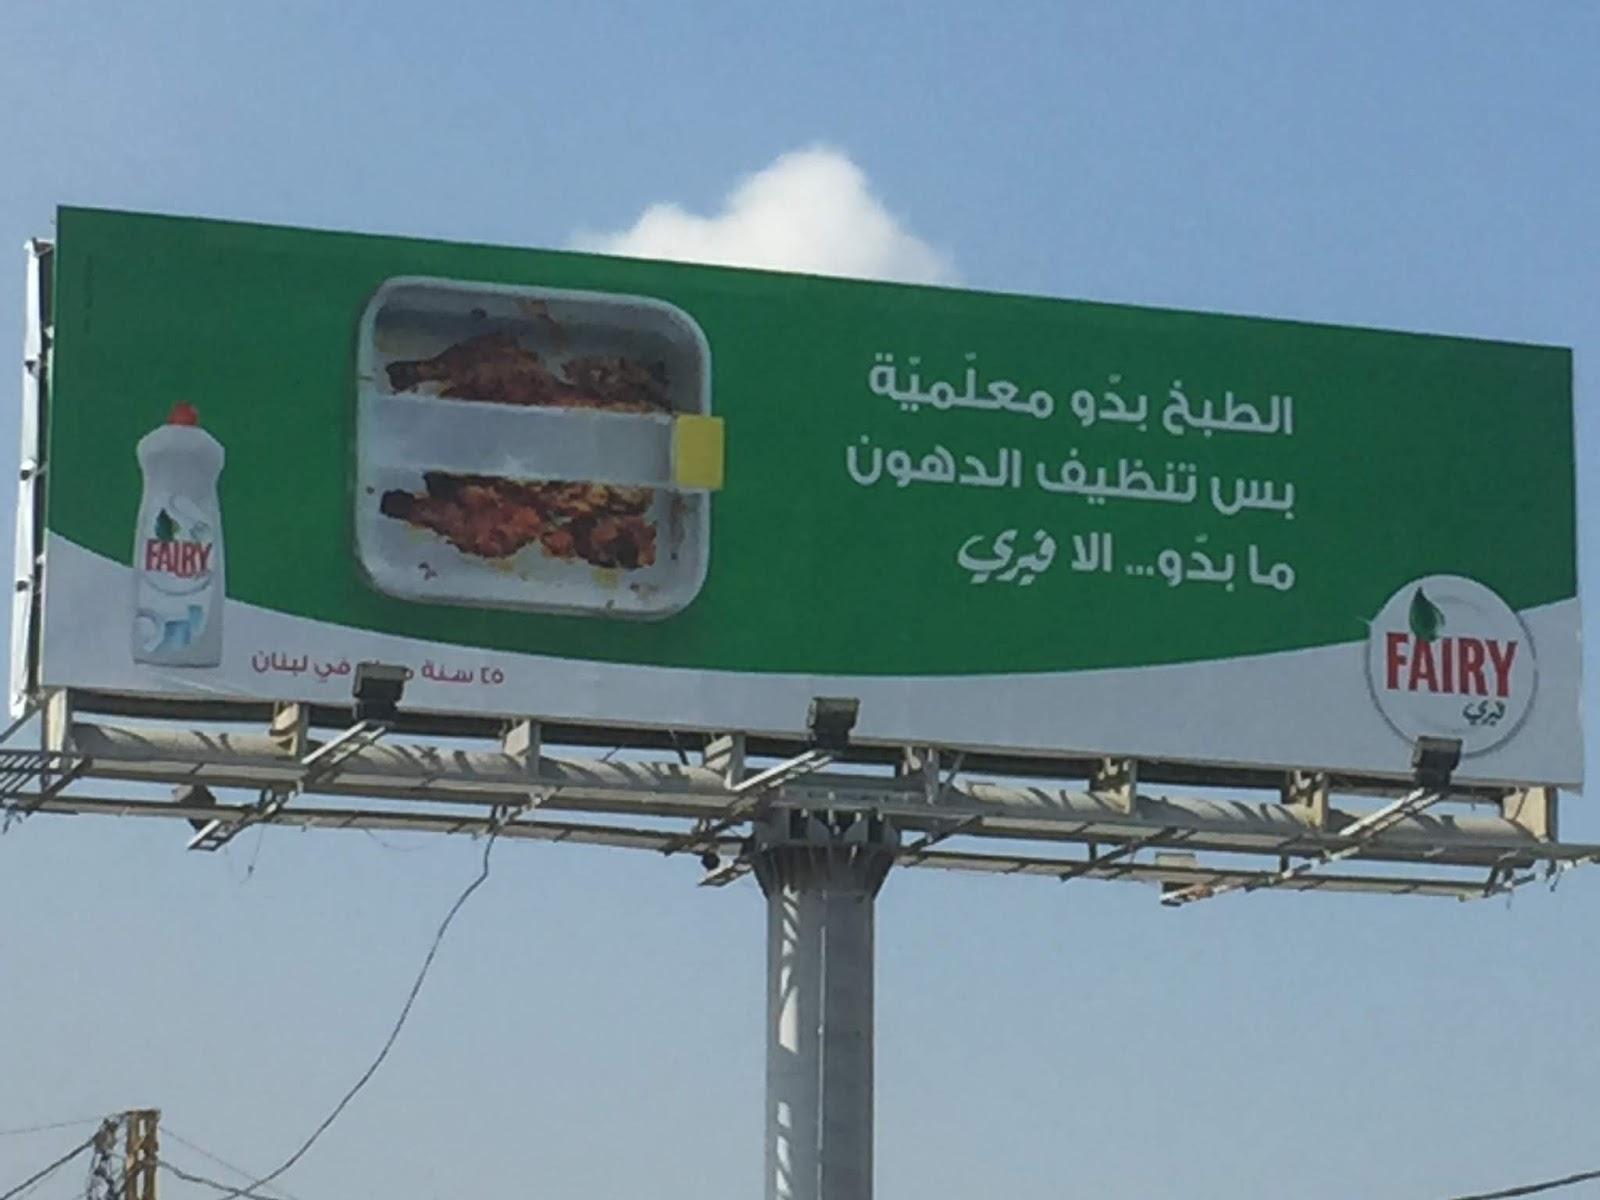 Tarek Chemaly: Fairy, a non-sexist ad!